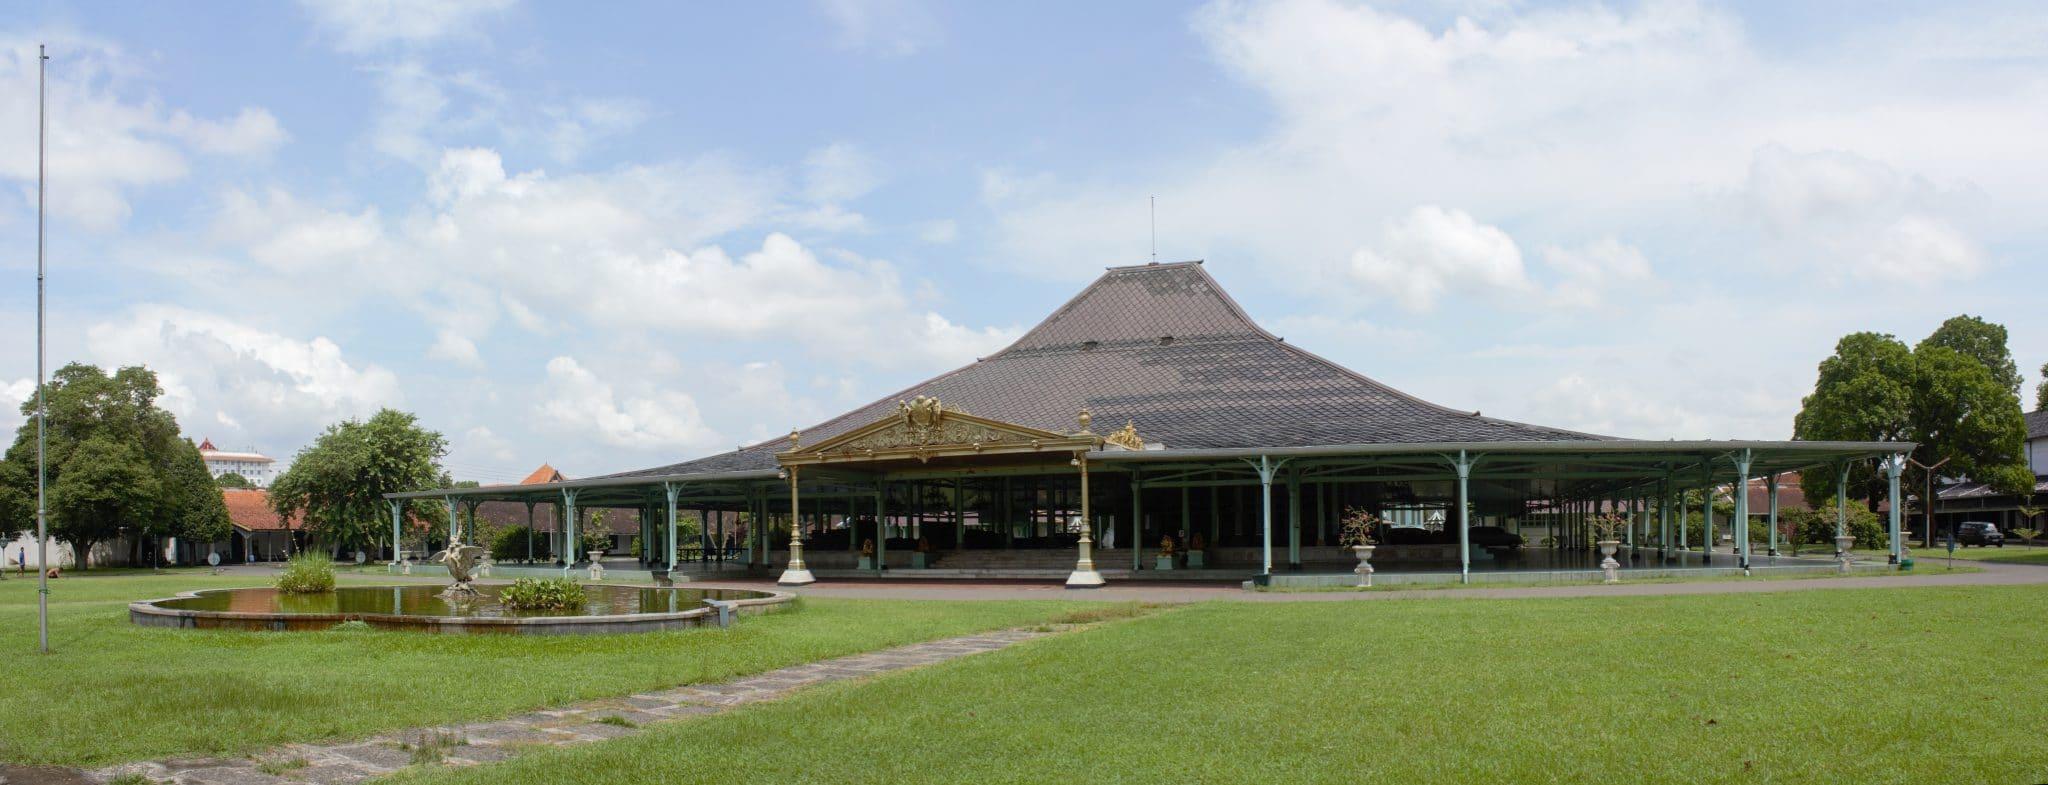 Mangkunegaran Palace à Surakarta